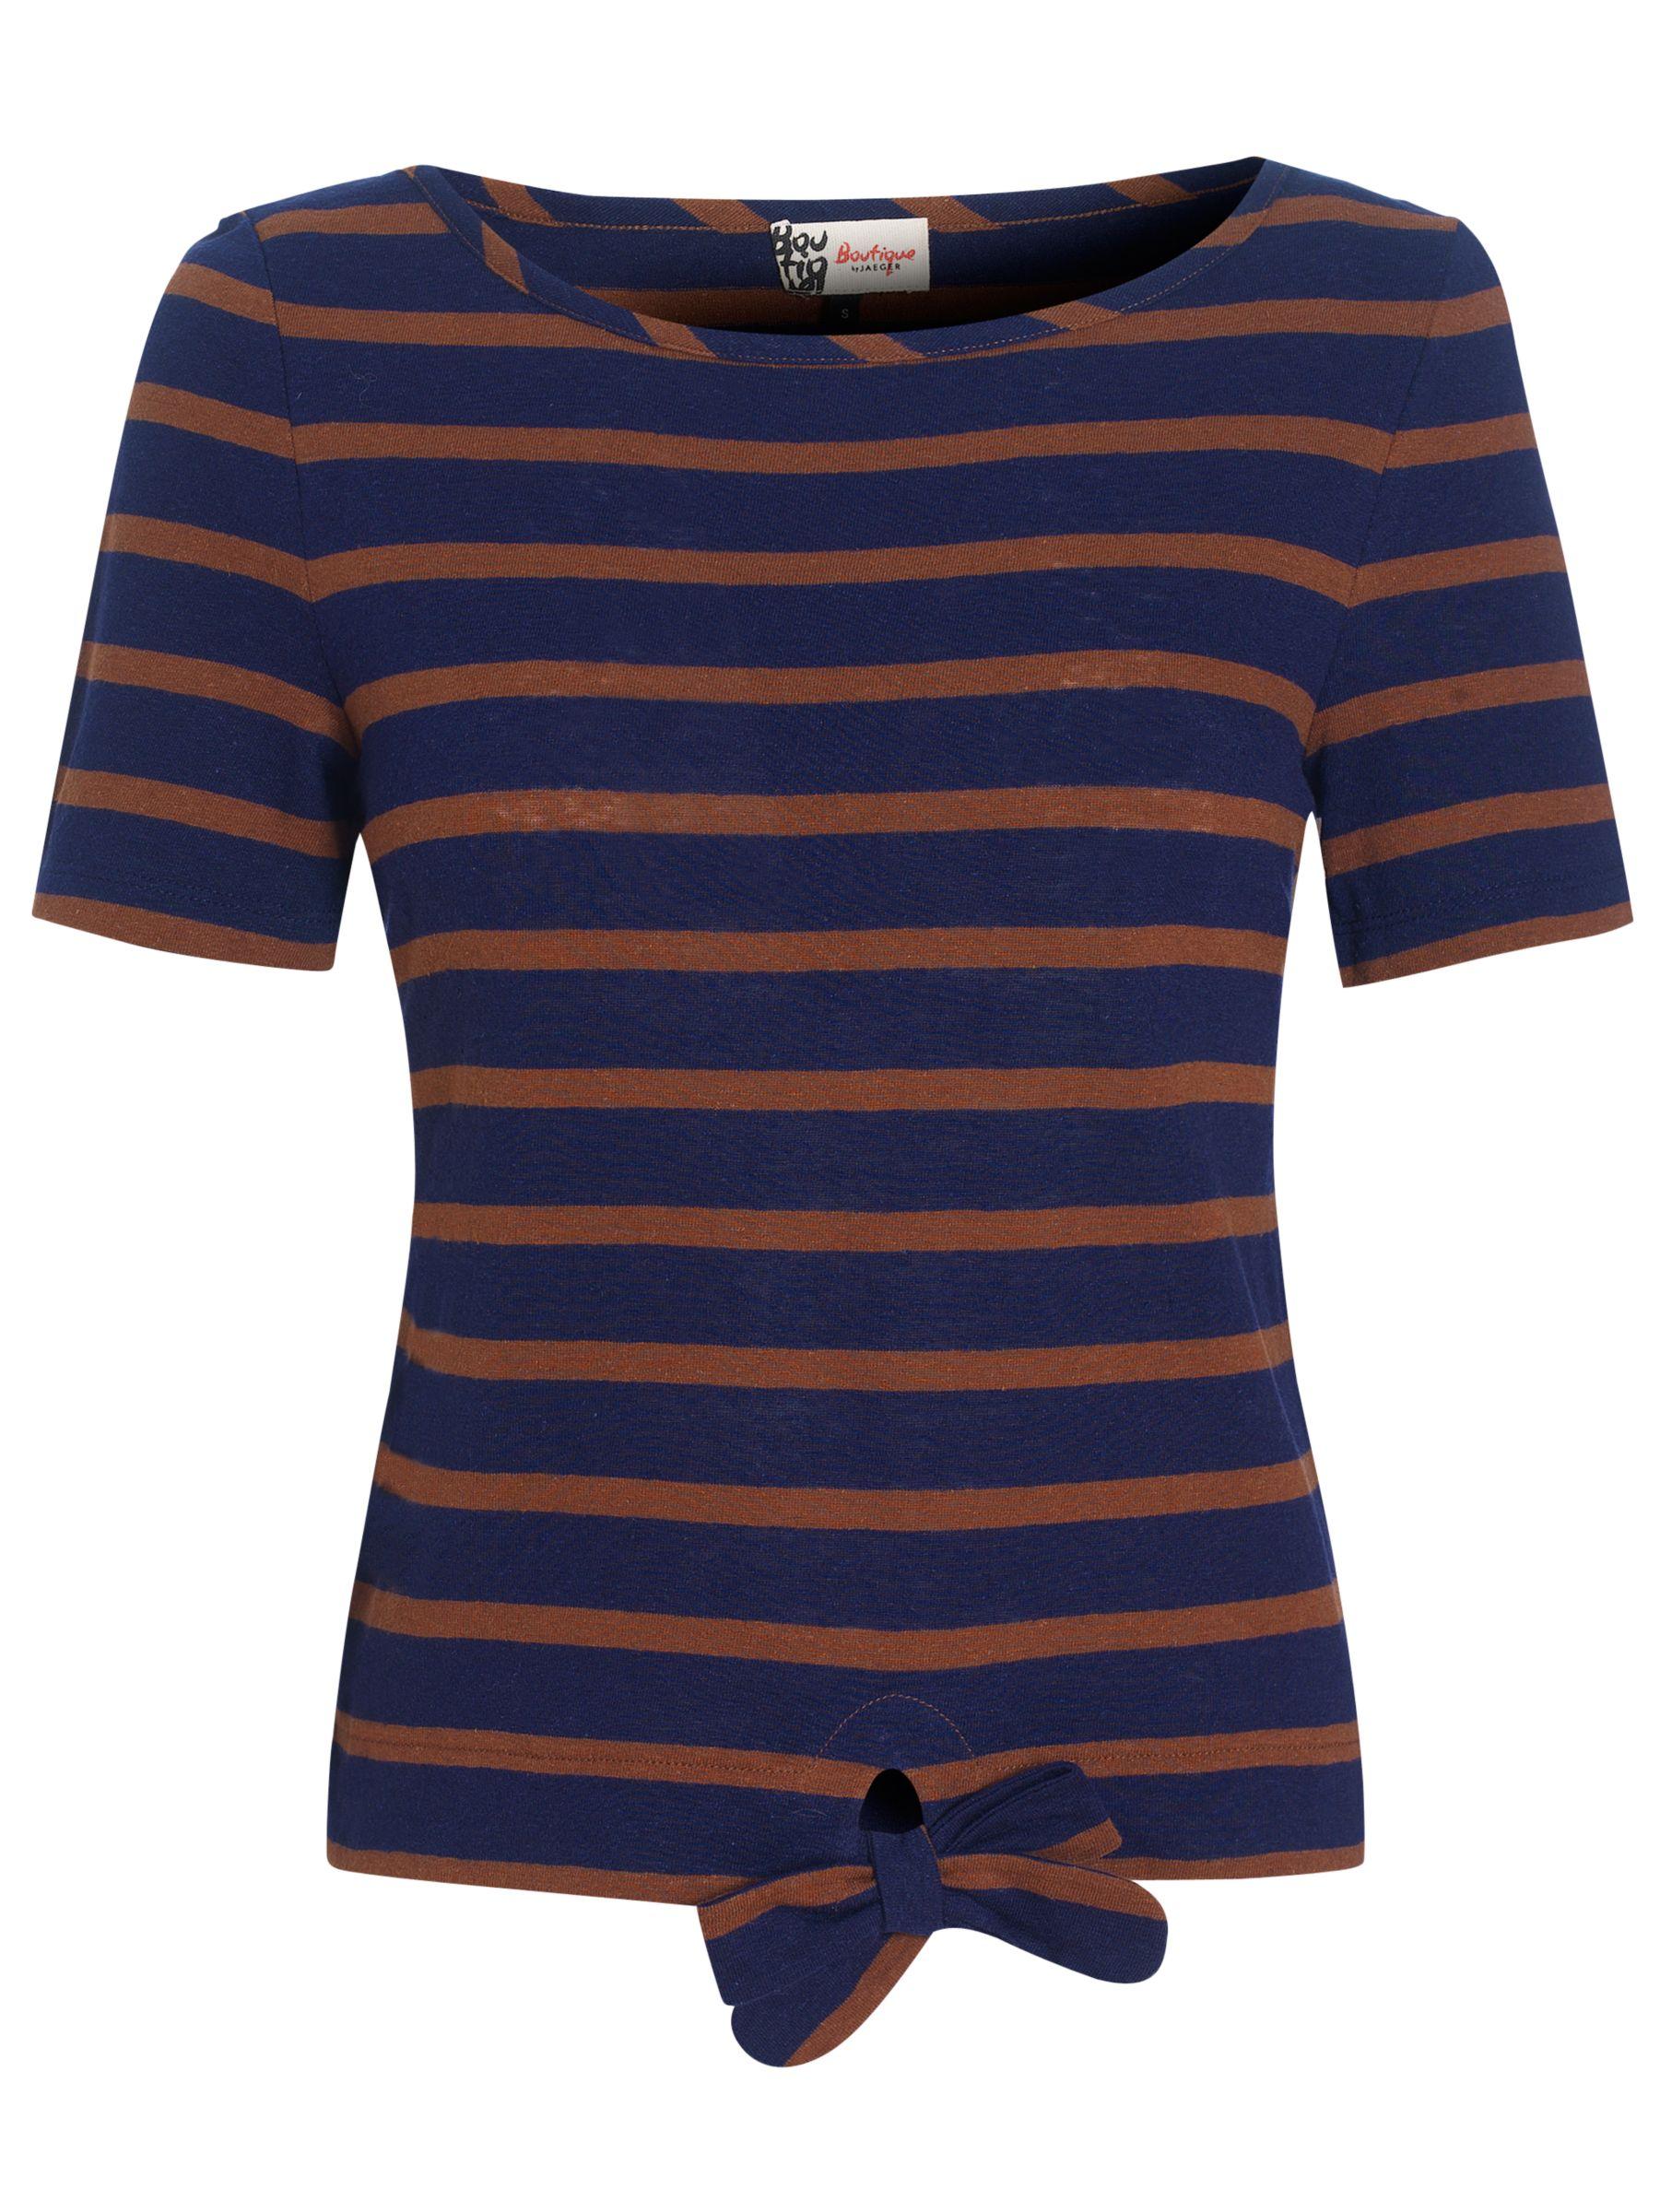 Stripe Knot T-Shirt, Navy